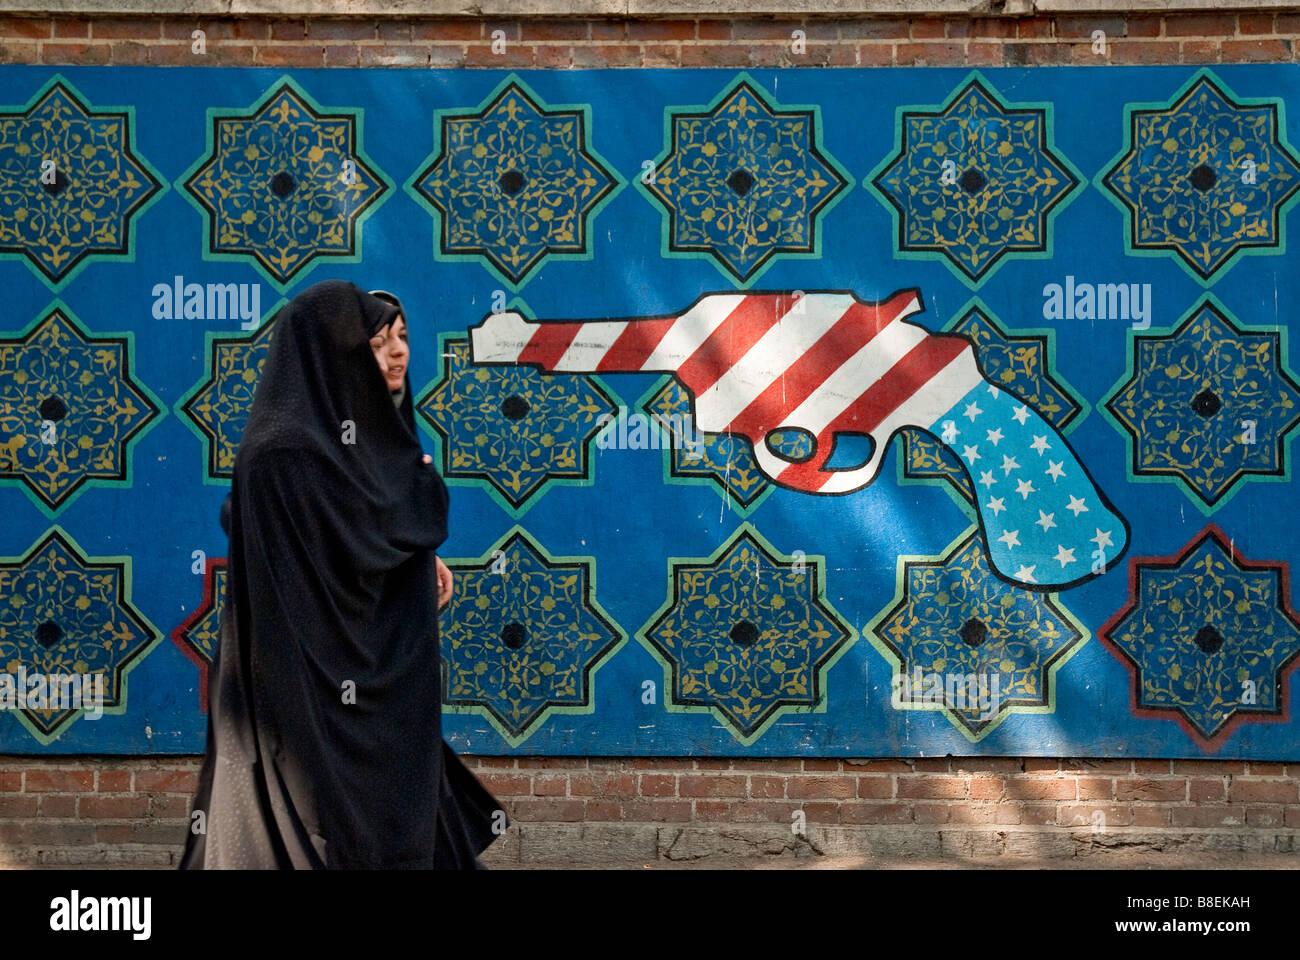 teheran extremist propaganda iran revolution jihad - Stock Image